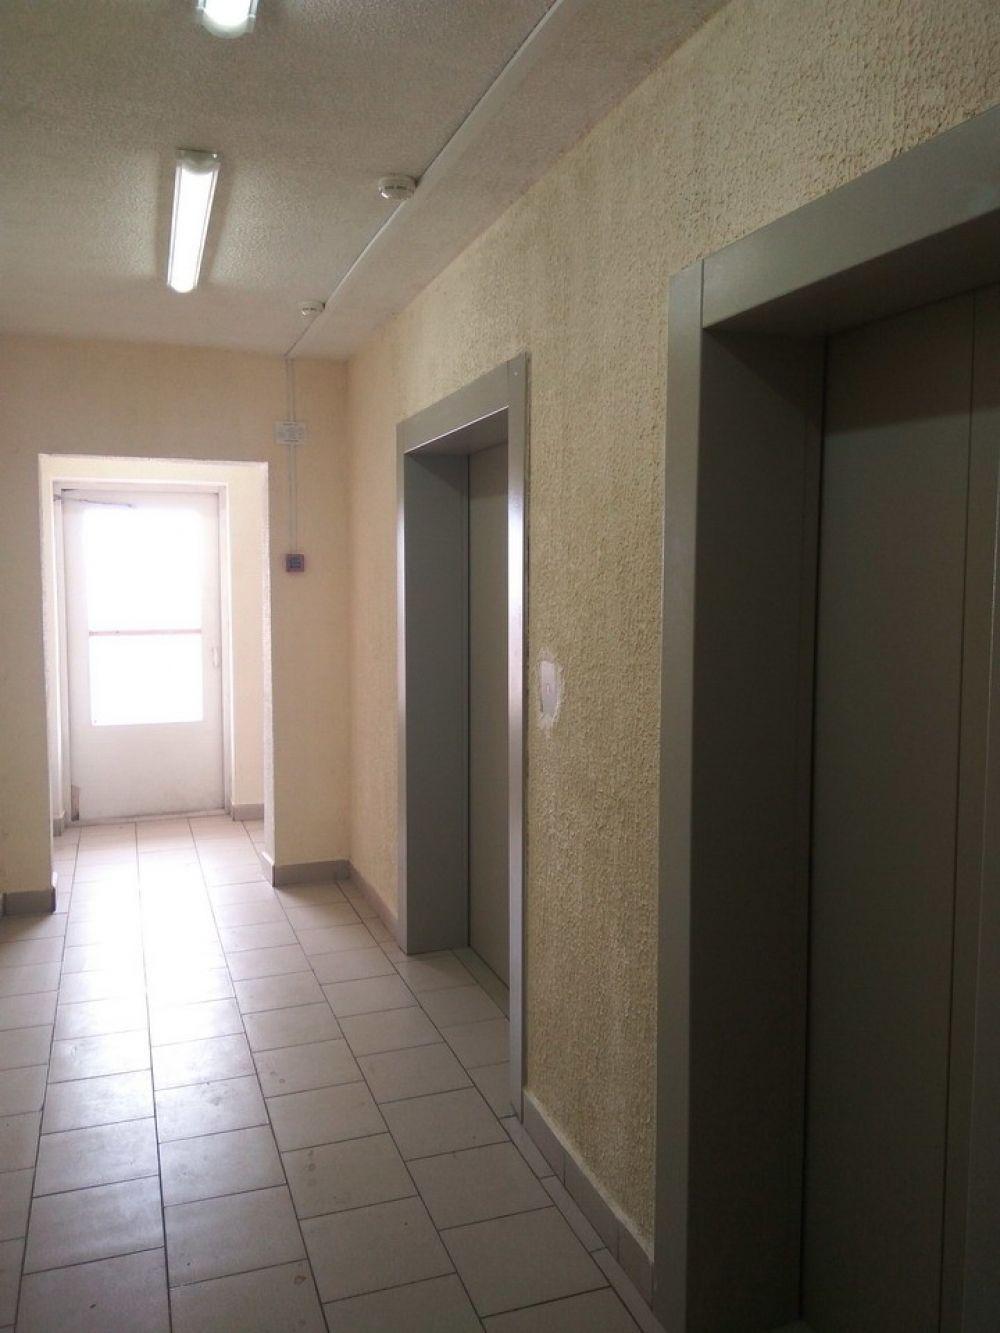 1-комнатная квартира 47.6 м2, г. Щелково, Богородский мкр,10, фото 3